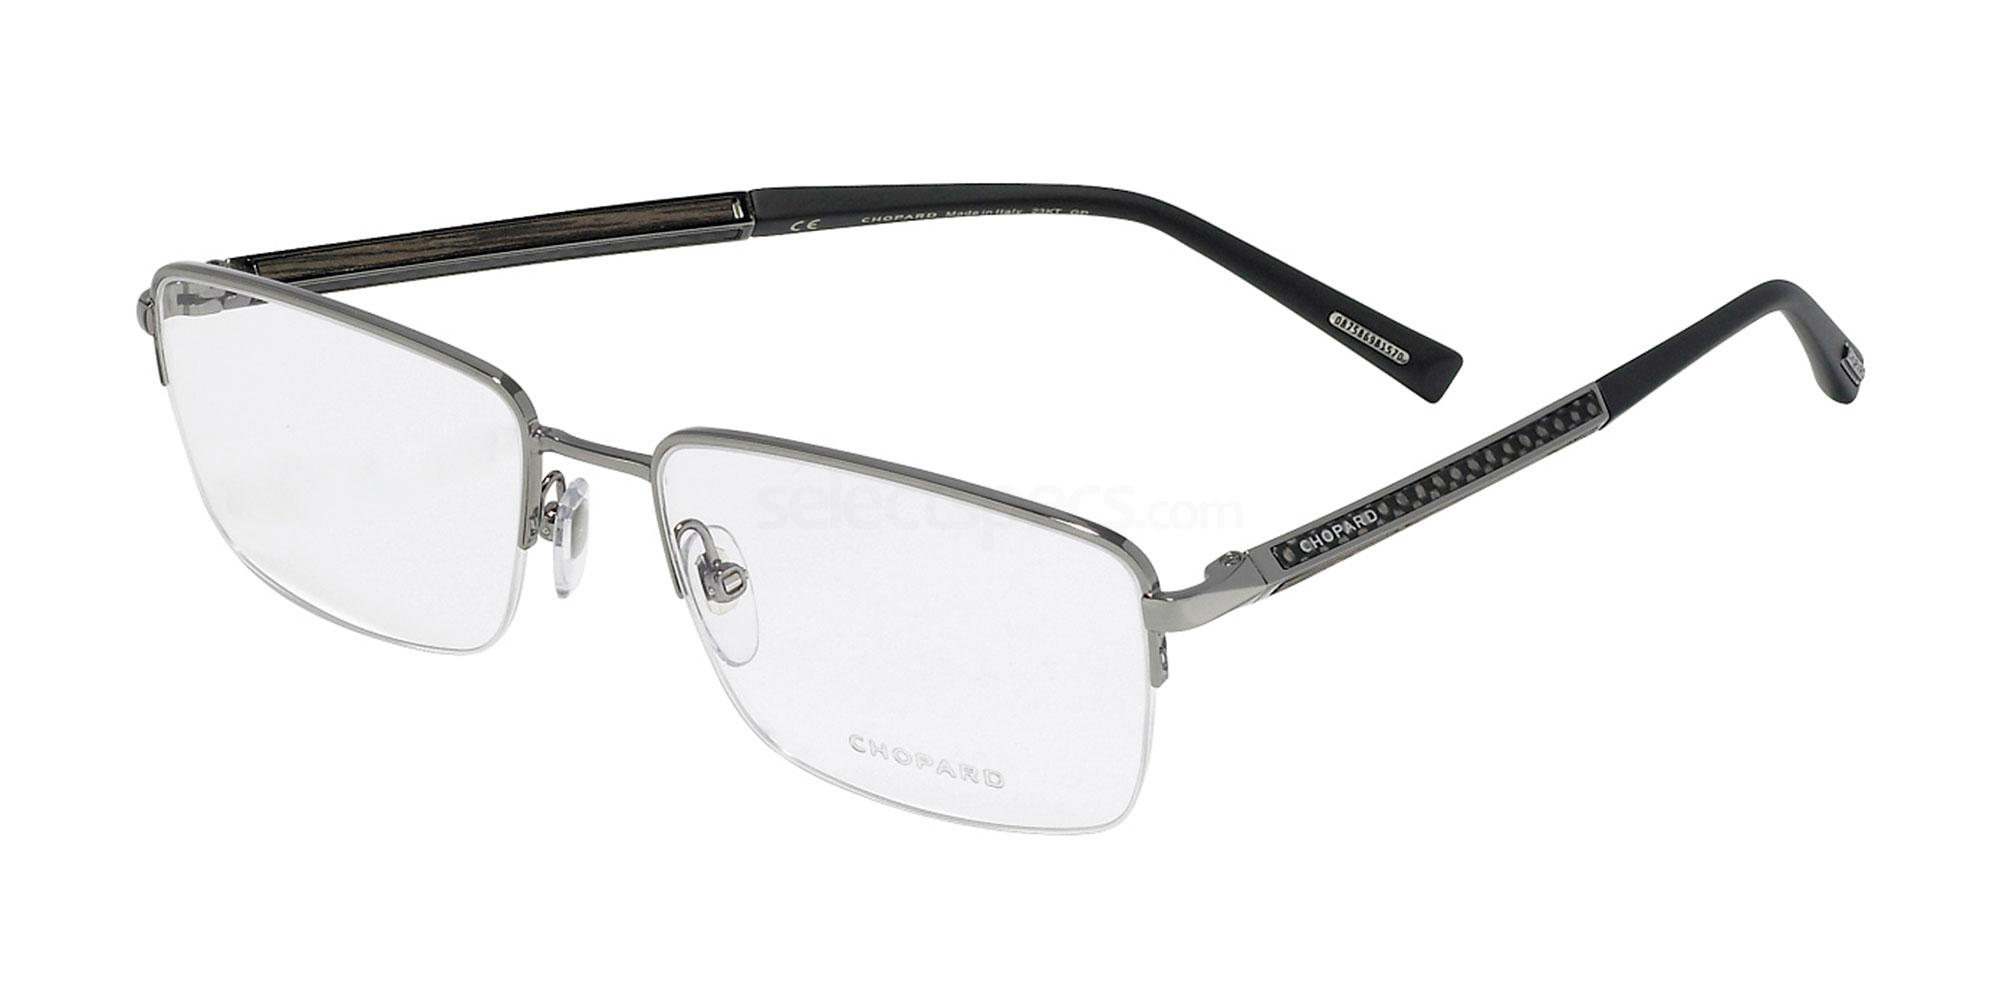 0509 VCHC98 Glasses, Chopard